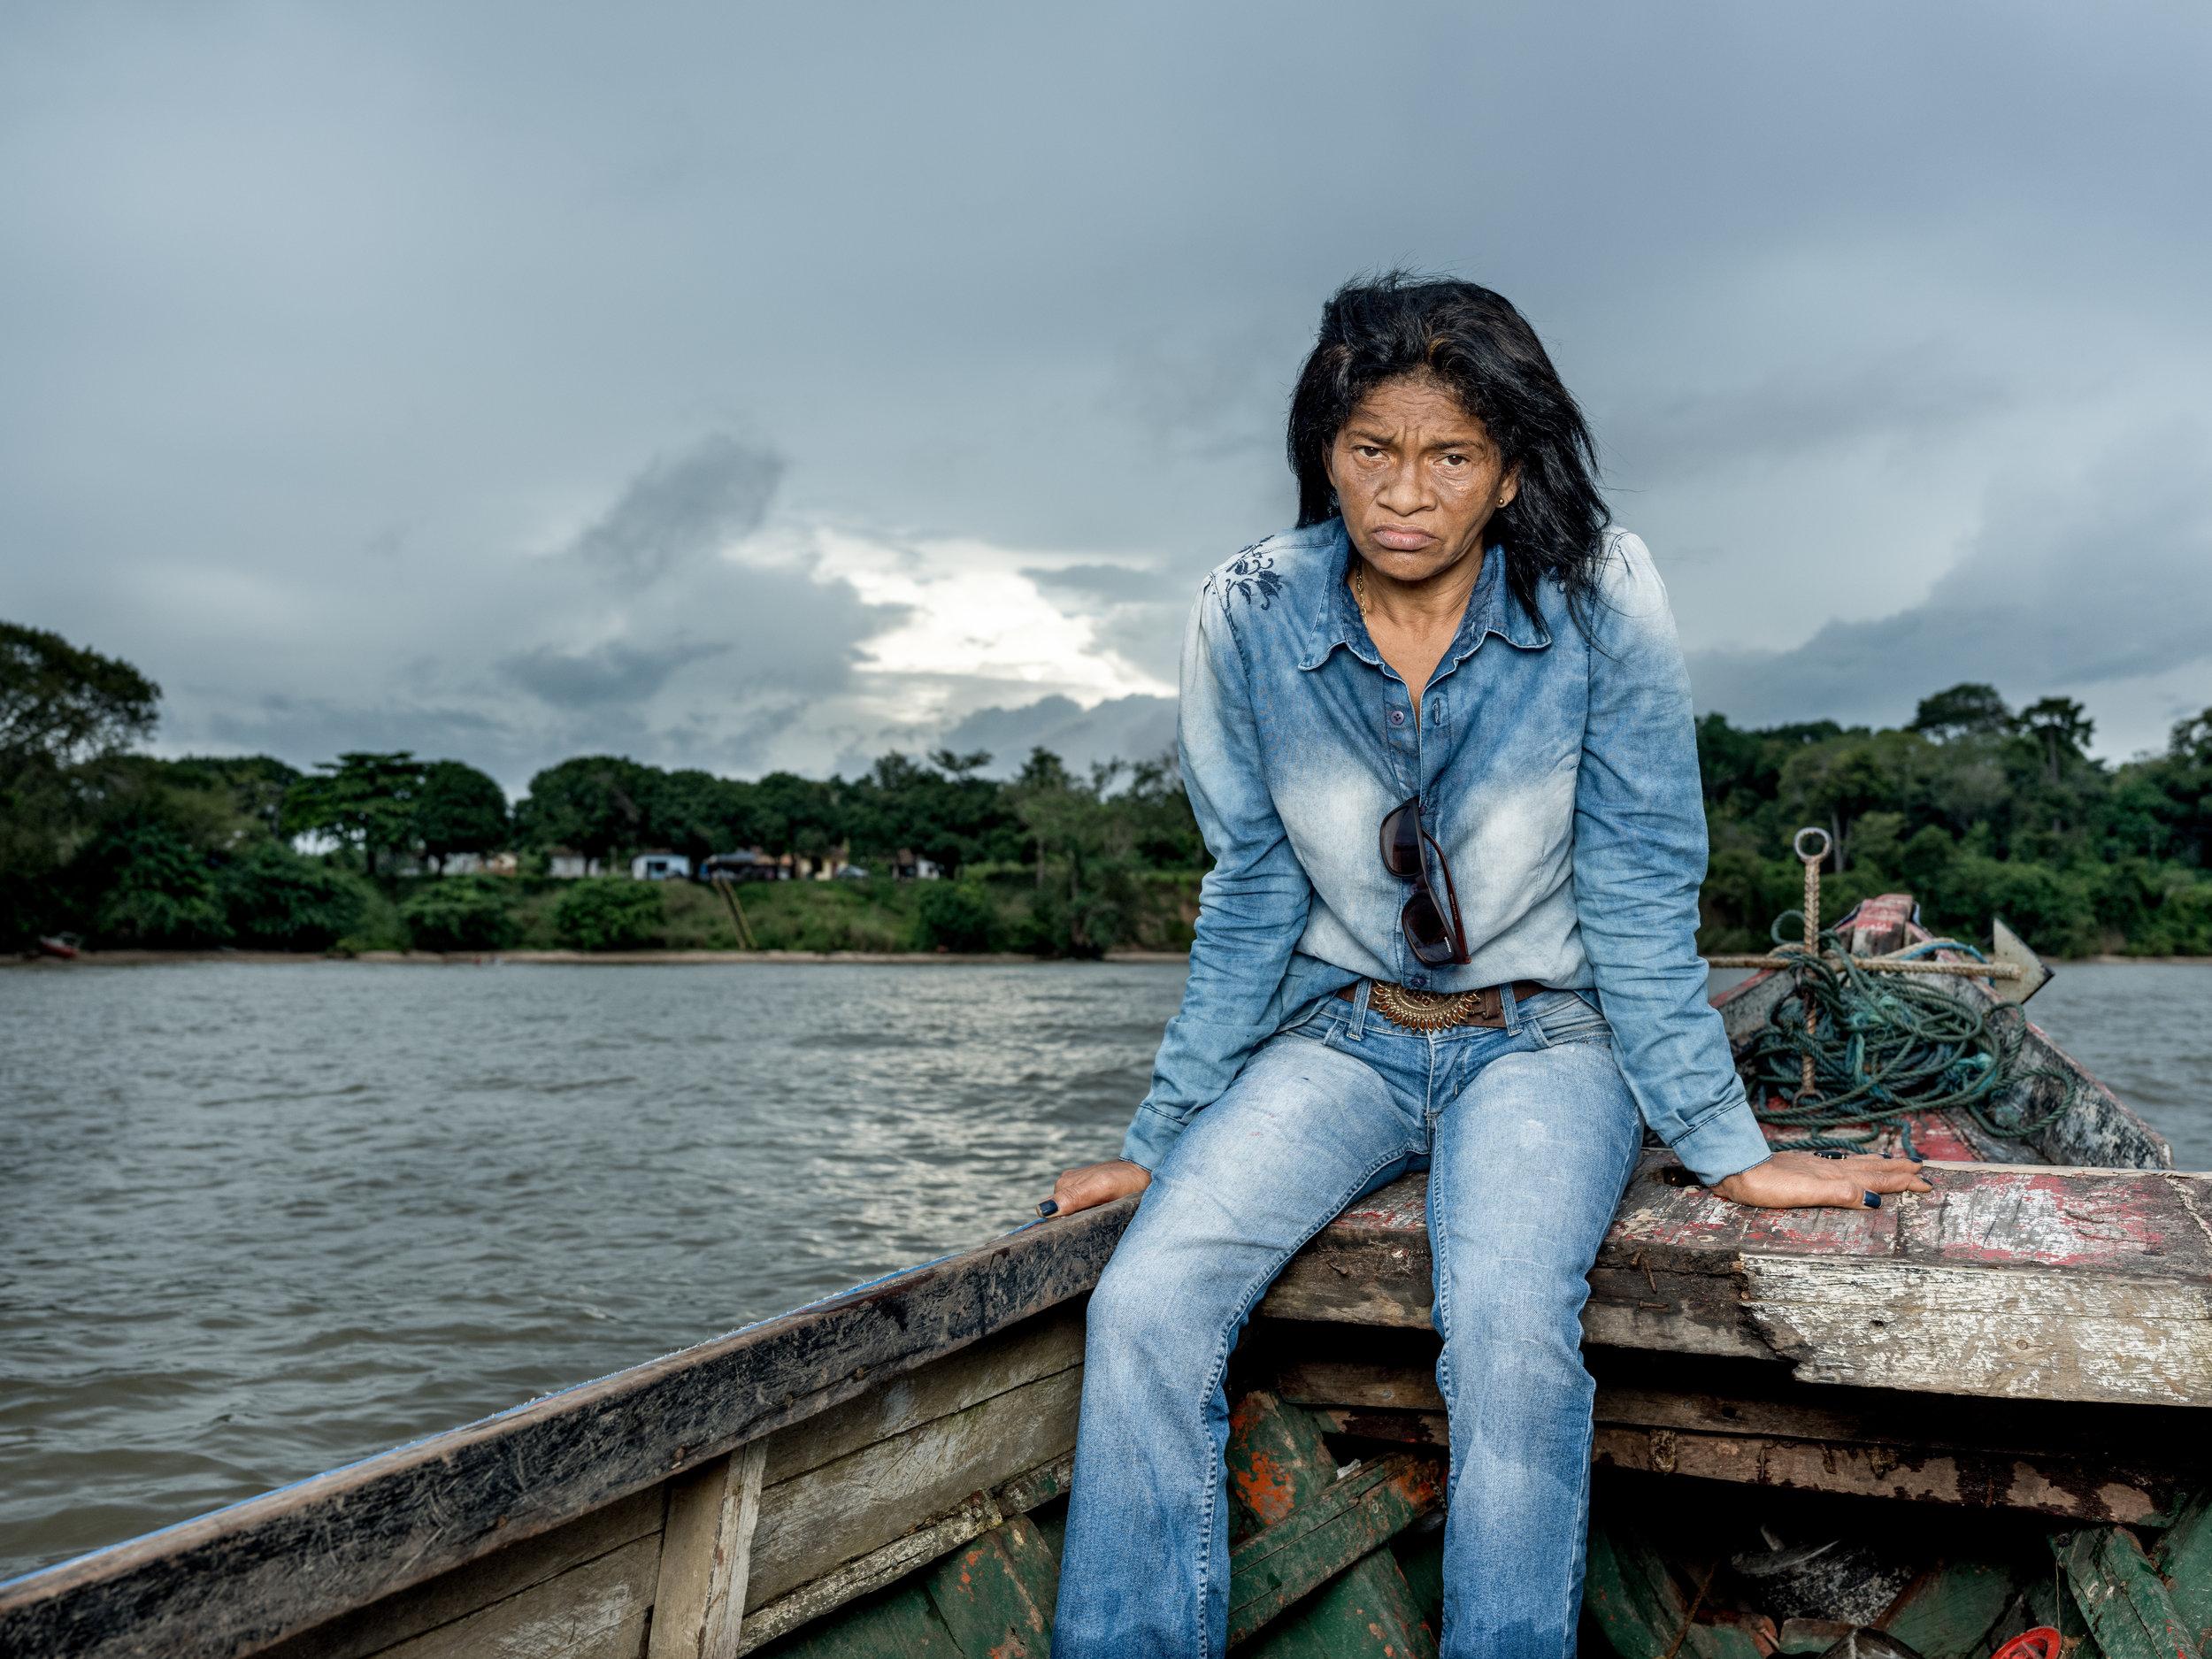 Maria Do Socorro Silva on the river in Barcarena